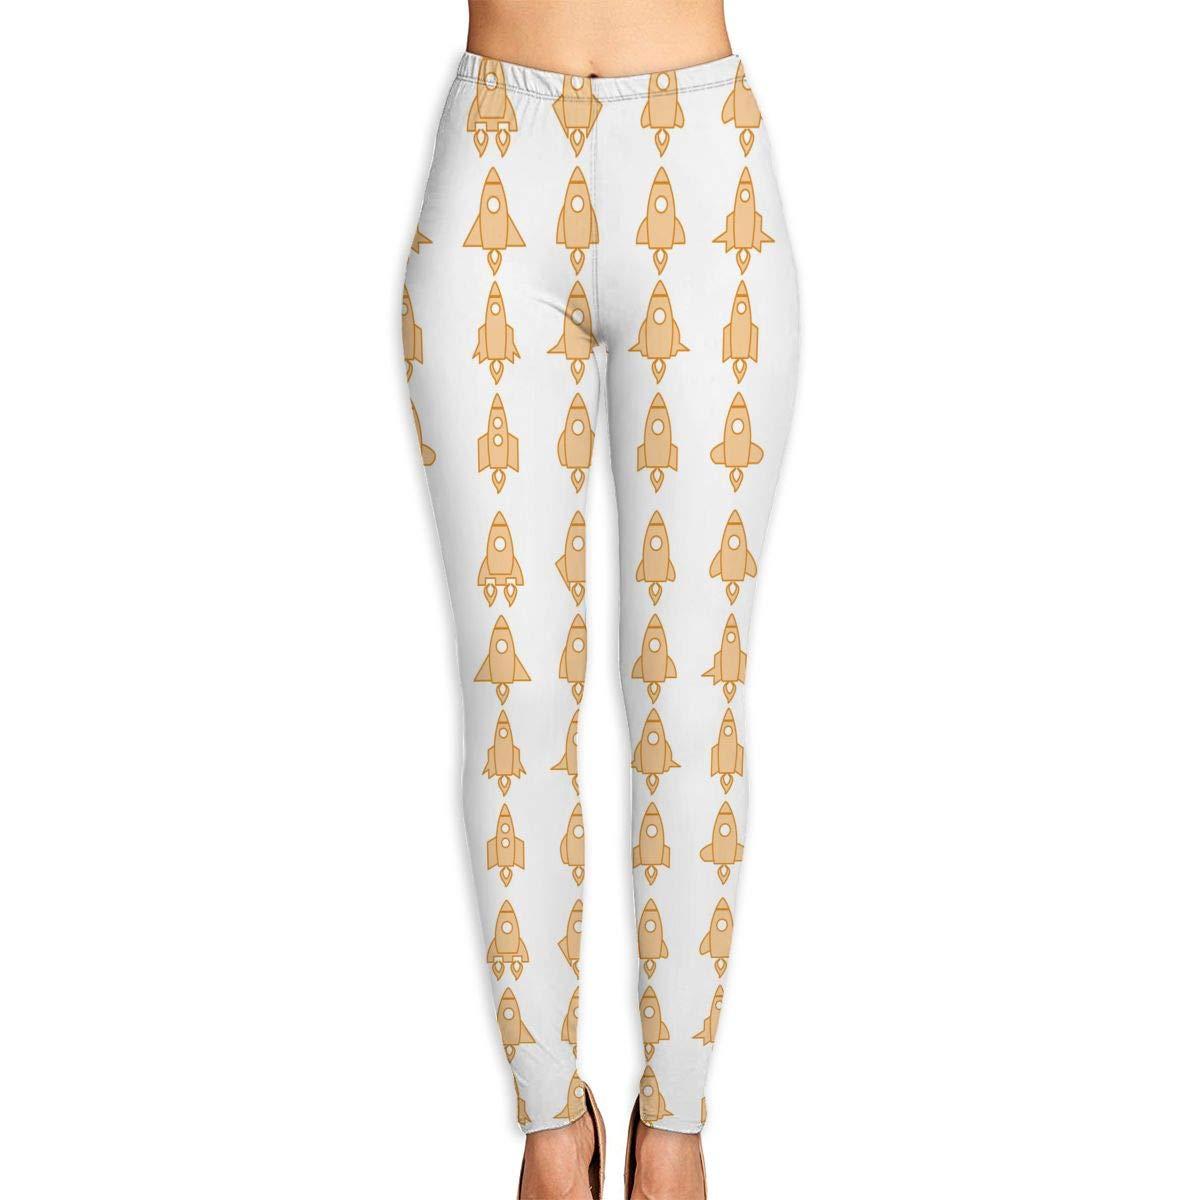 Amazon.com: Womens Rocket Icon Set High Waist Skinny Yoga ...